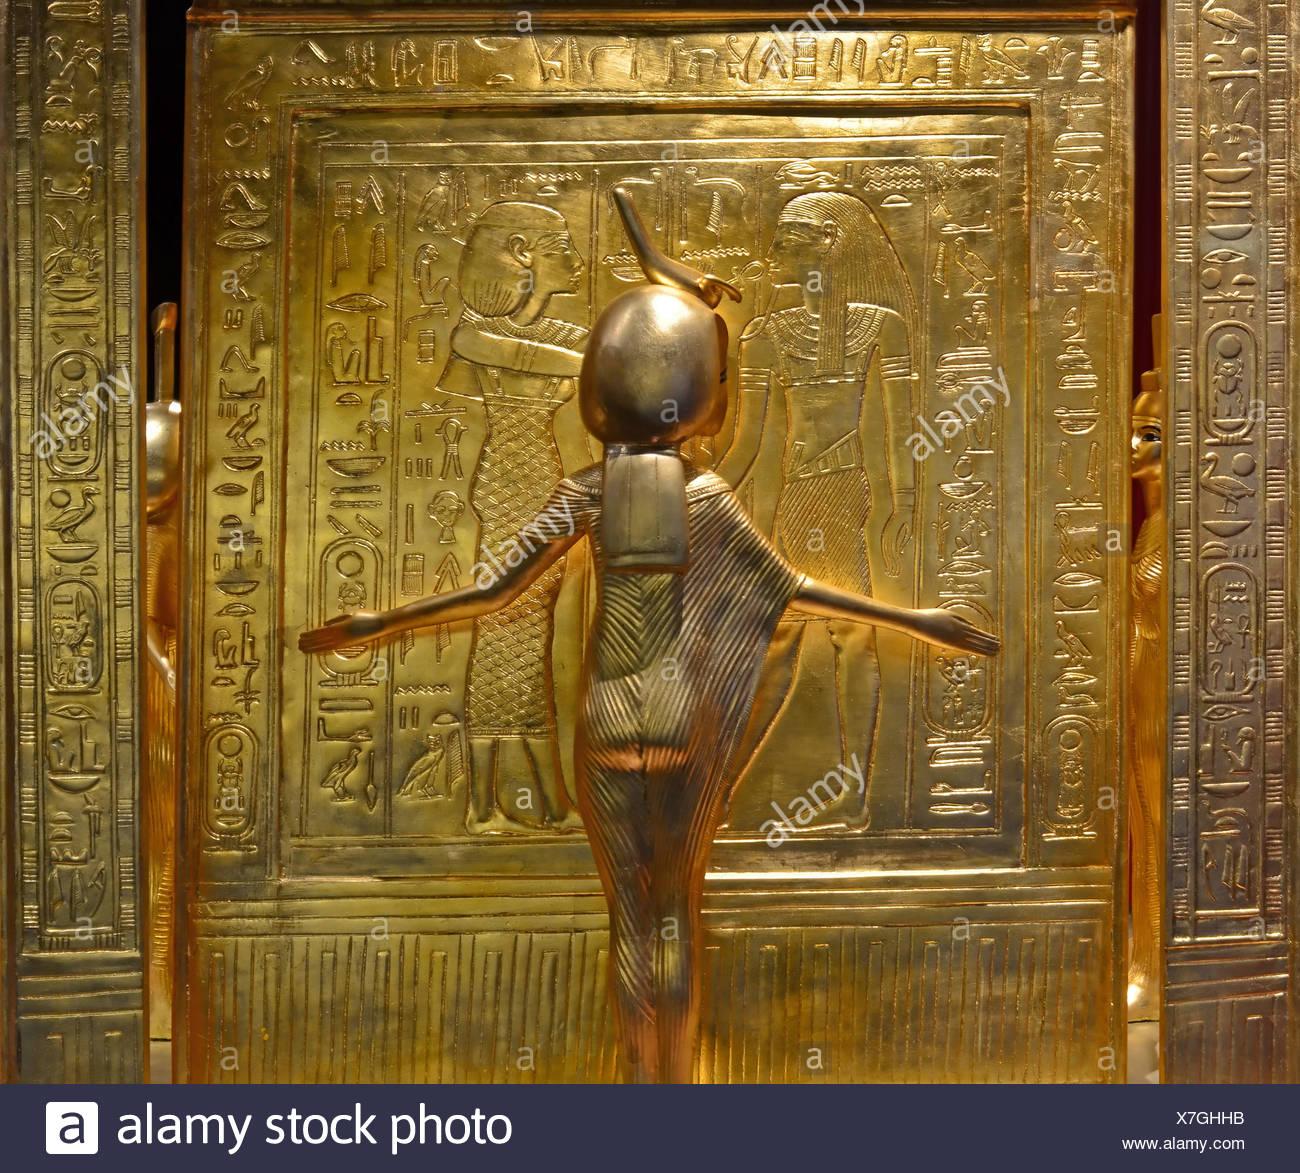 Tutankhamen Tutankhaten Tutankhamon Tutankhamun Tutankhamoun treasure Egypt ancient Egypt pharaoh king king tut gold wealth f - Stock Image